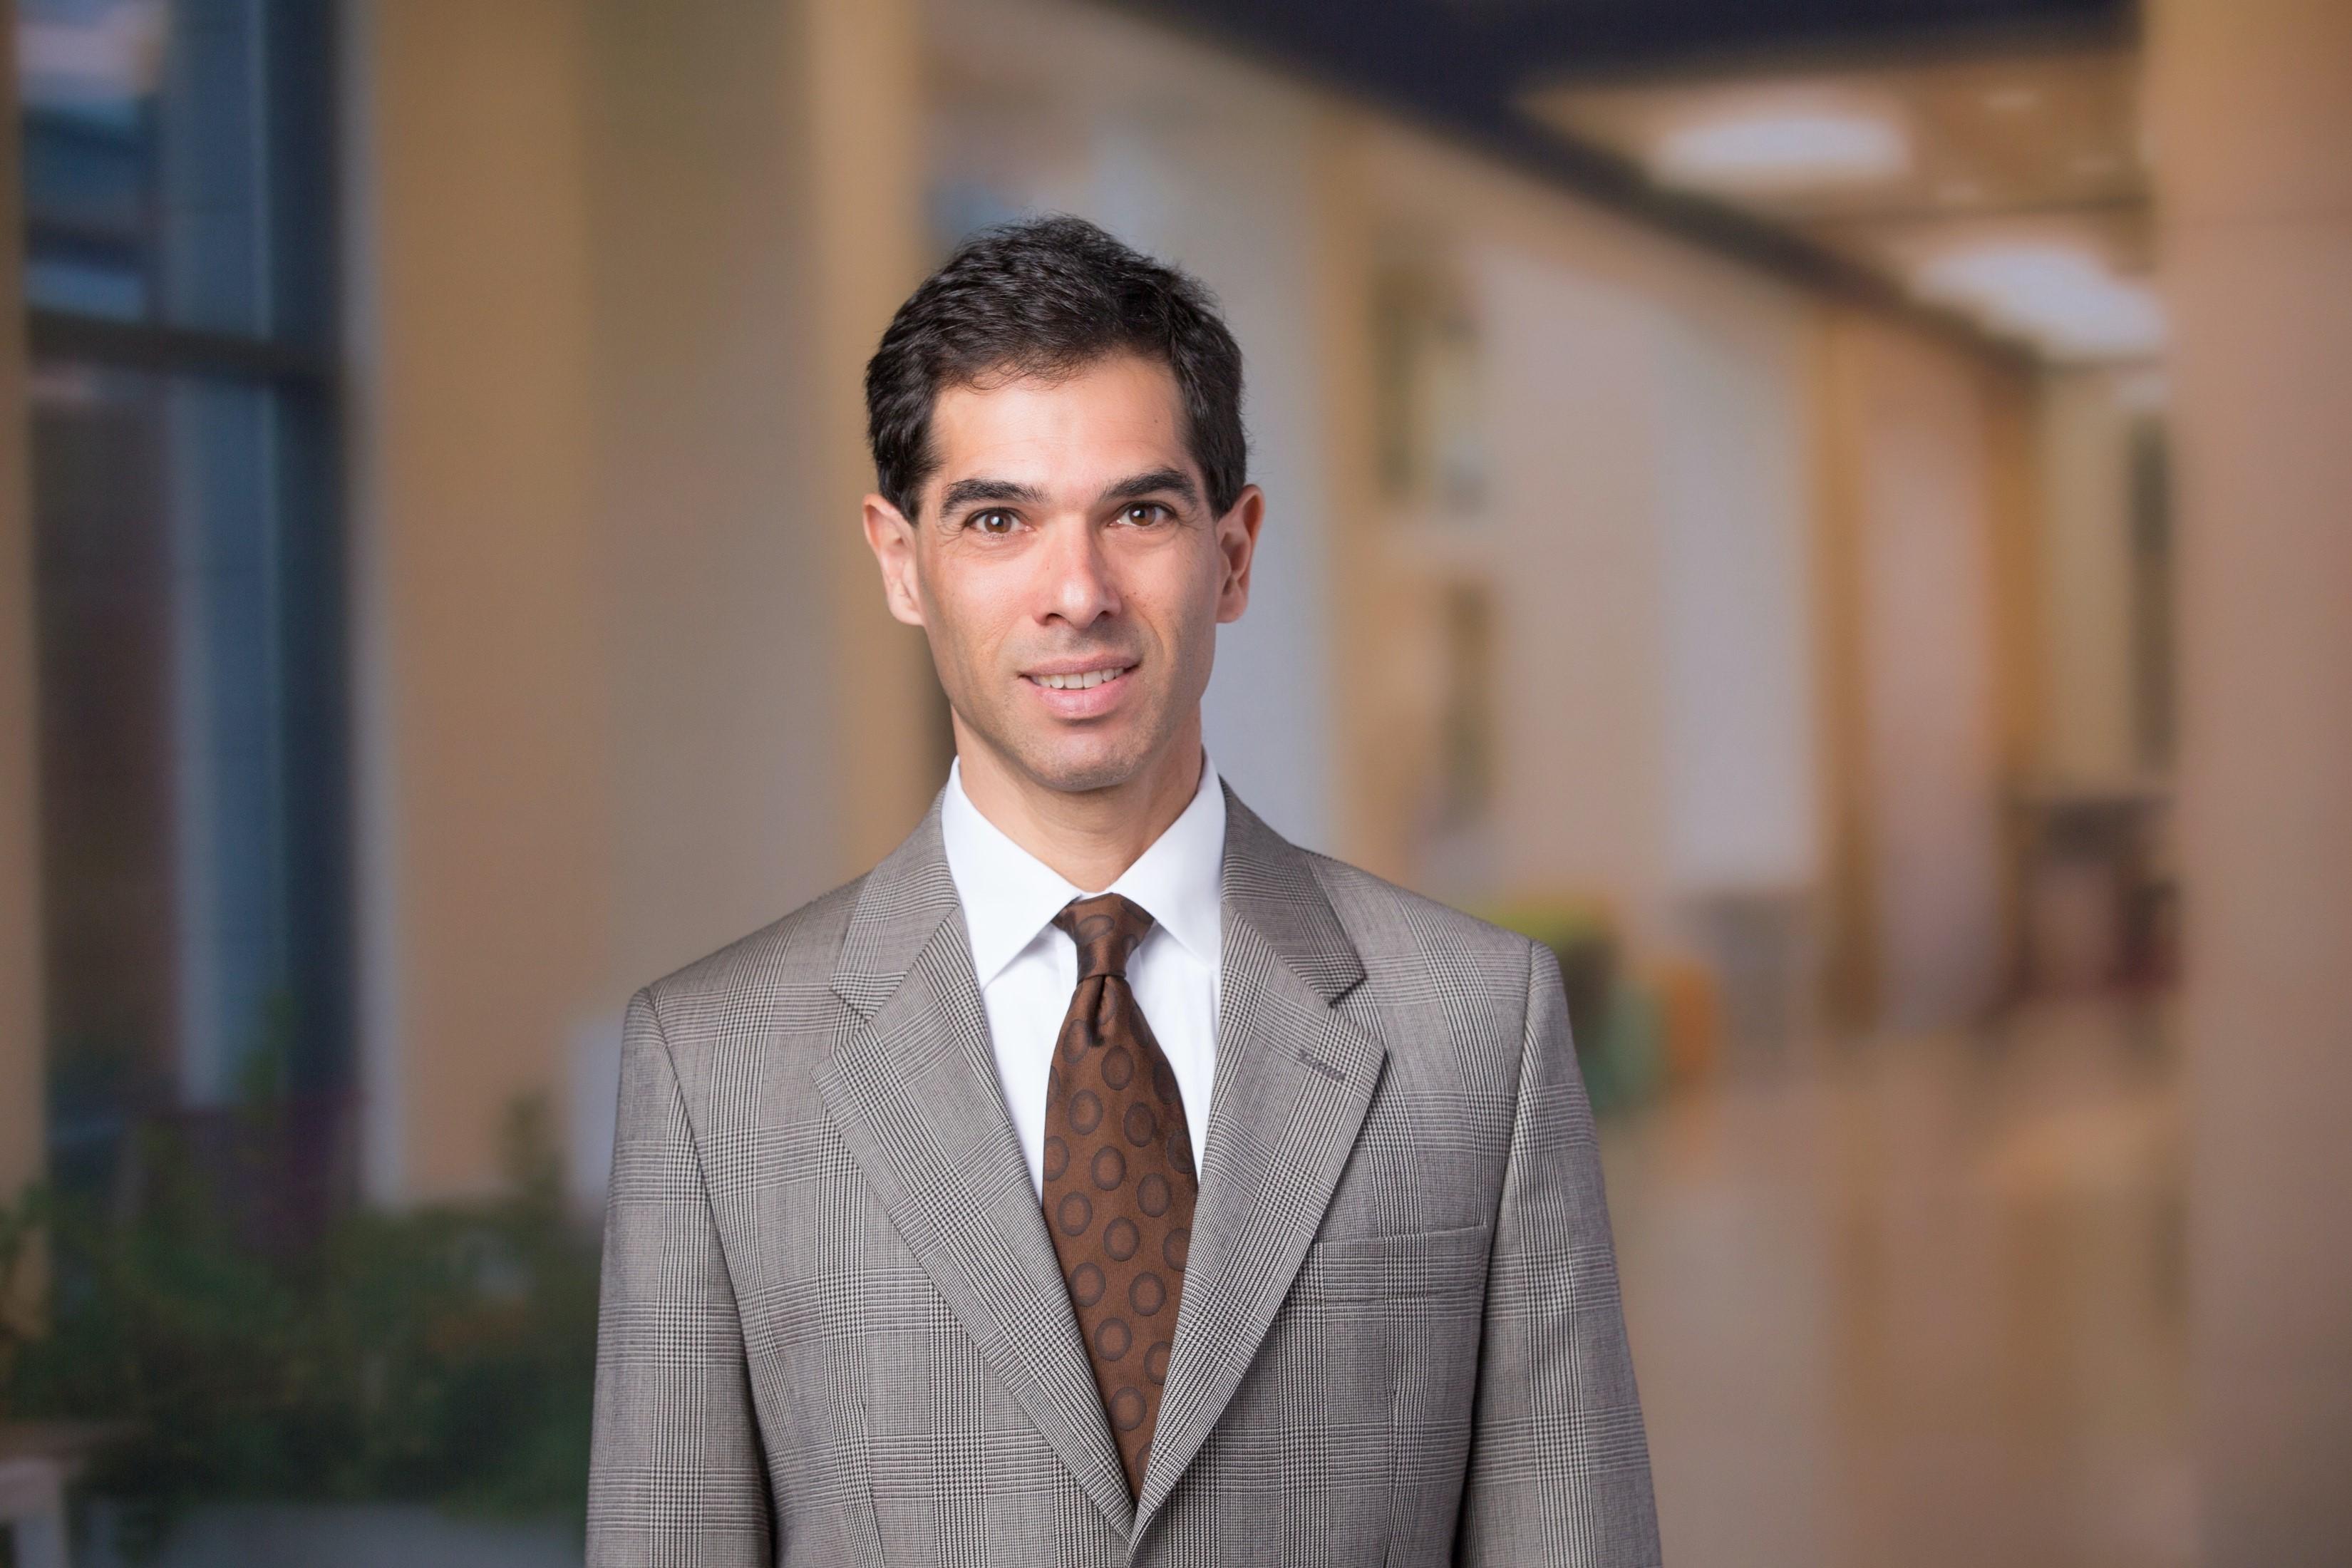 Dr. Ethan Berke UnitedHealth Group